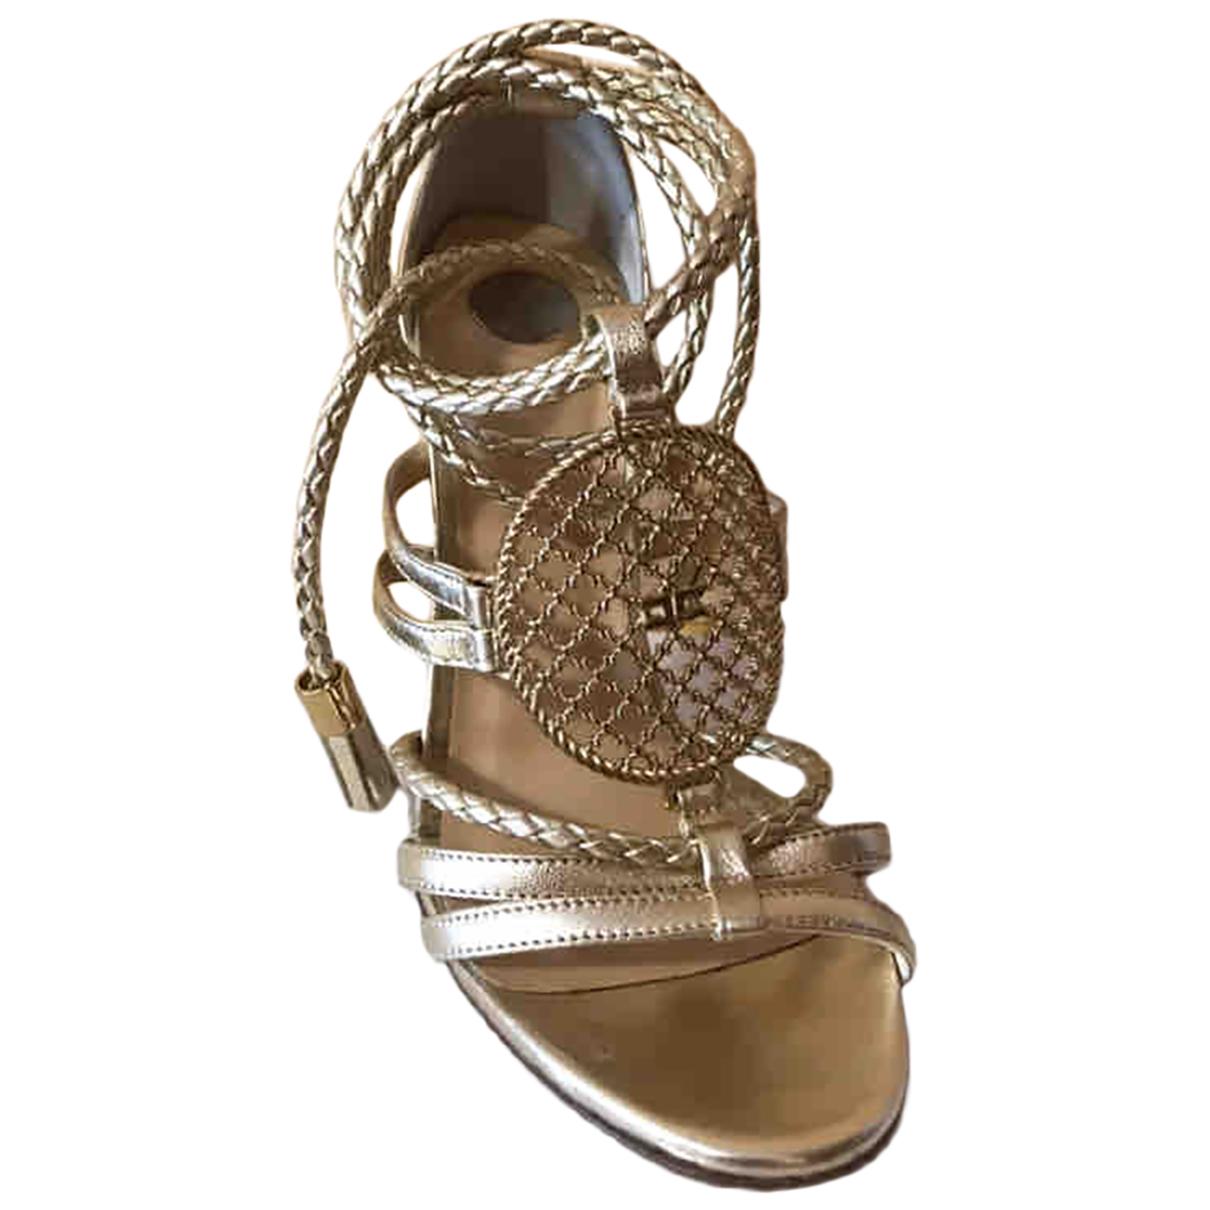 Elisabetta Franchi N Gold Leather Sandals for Women 37 EU